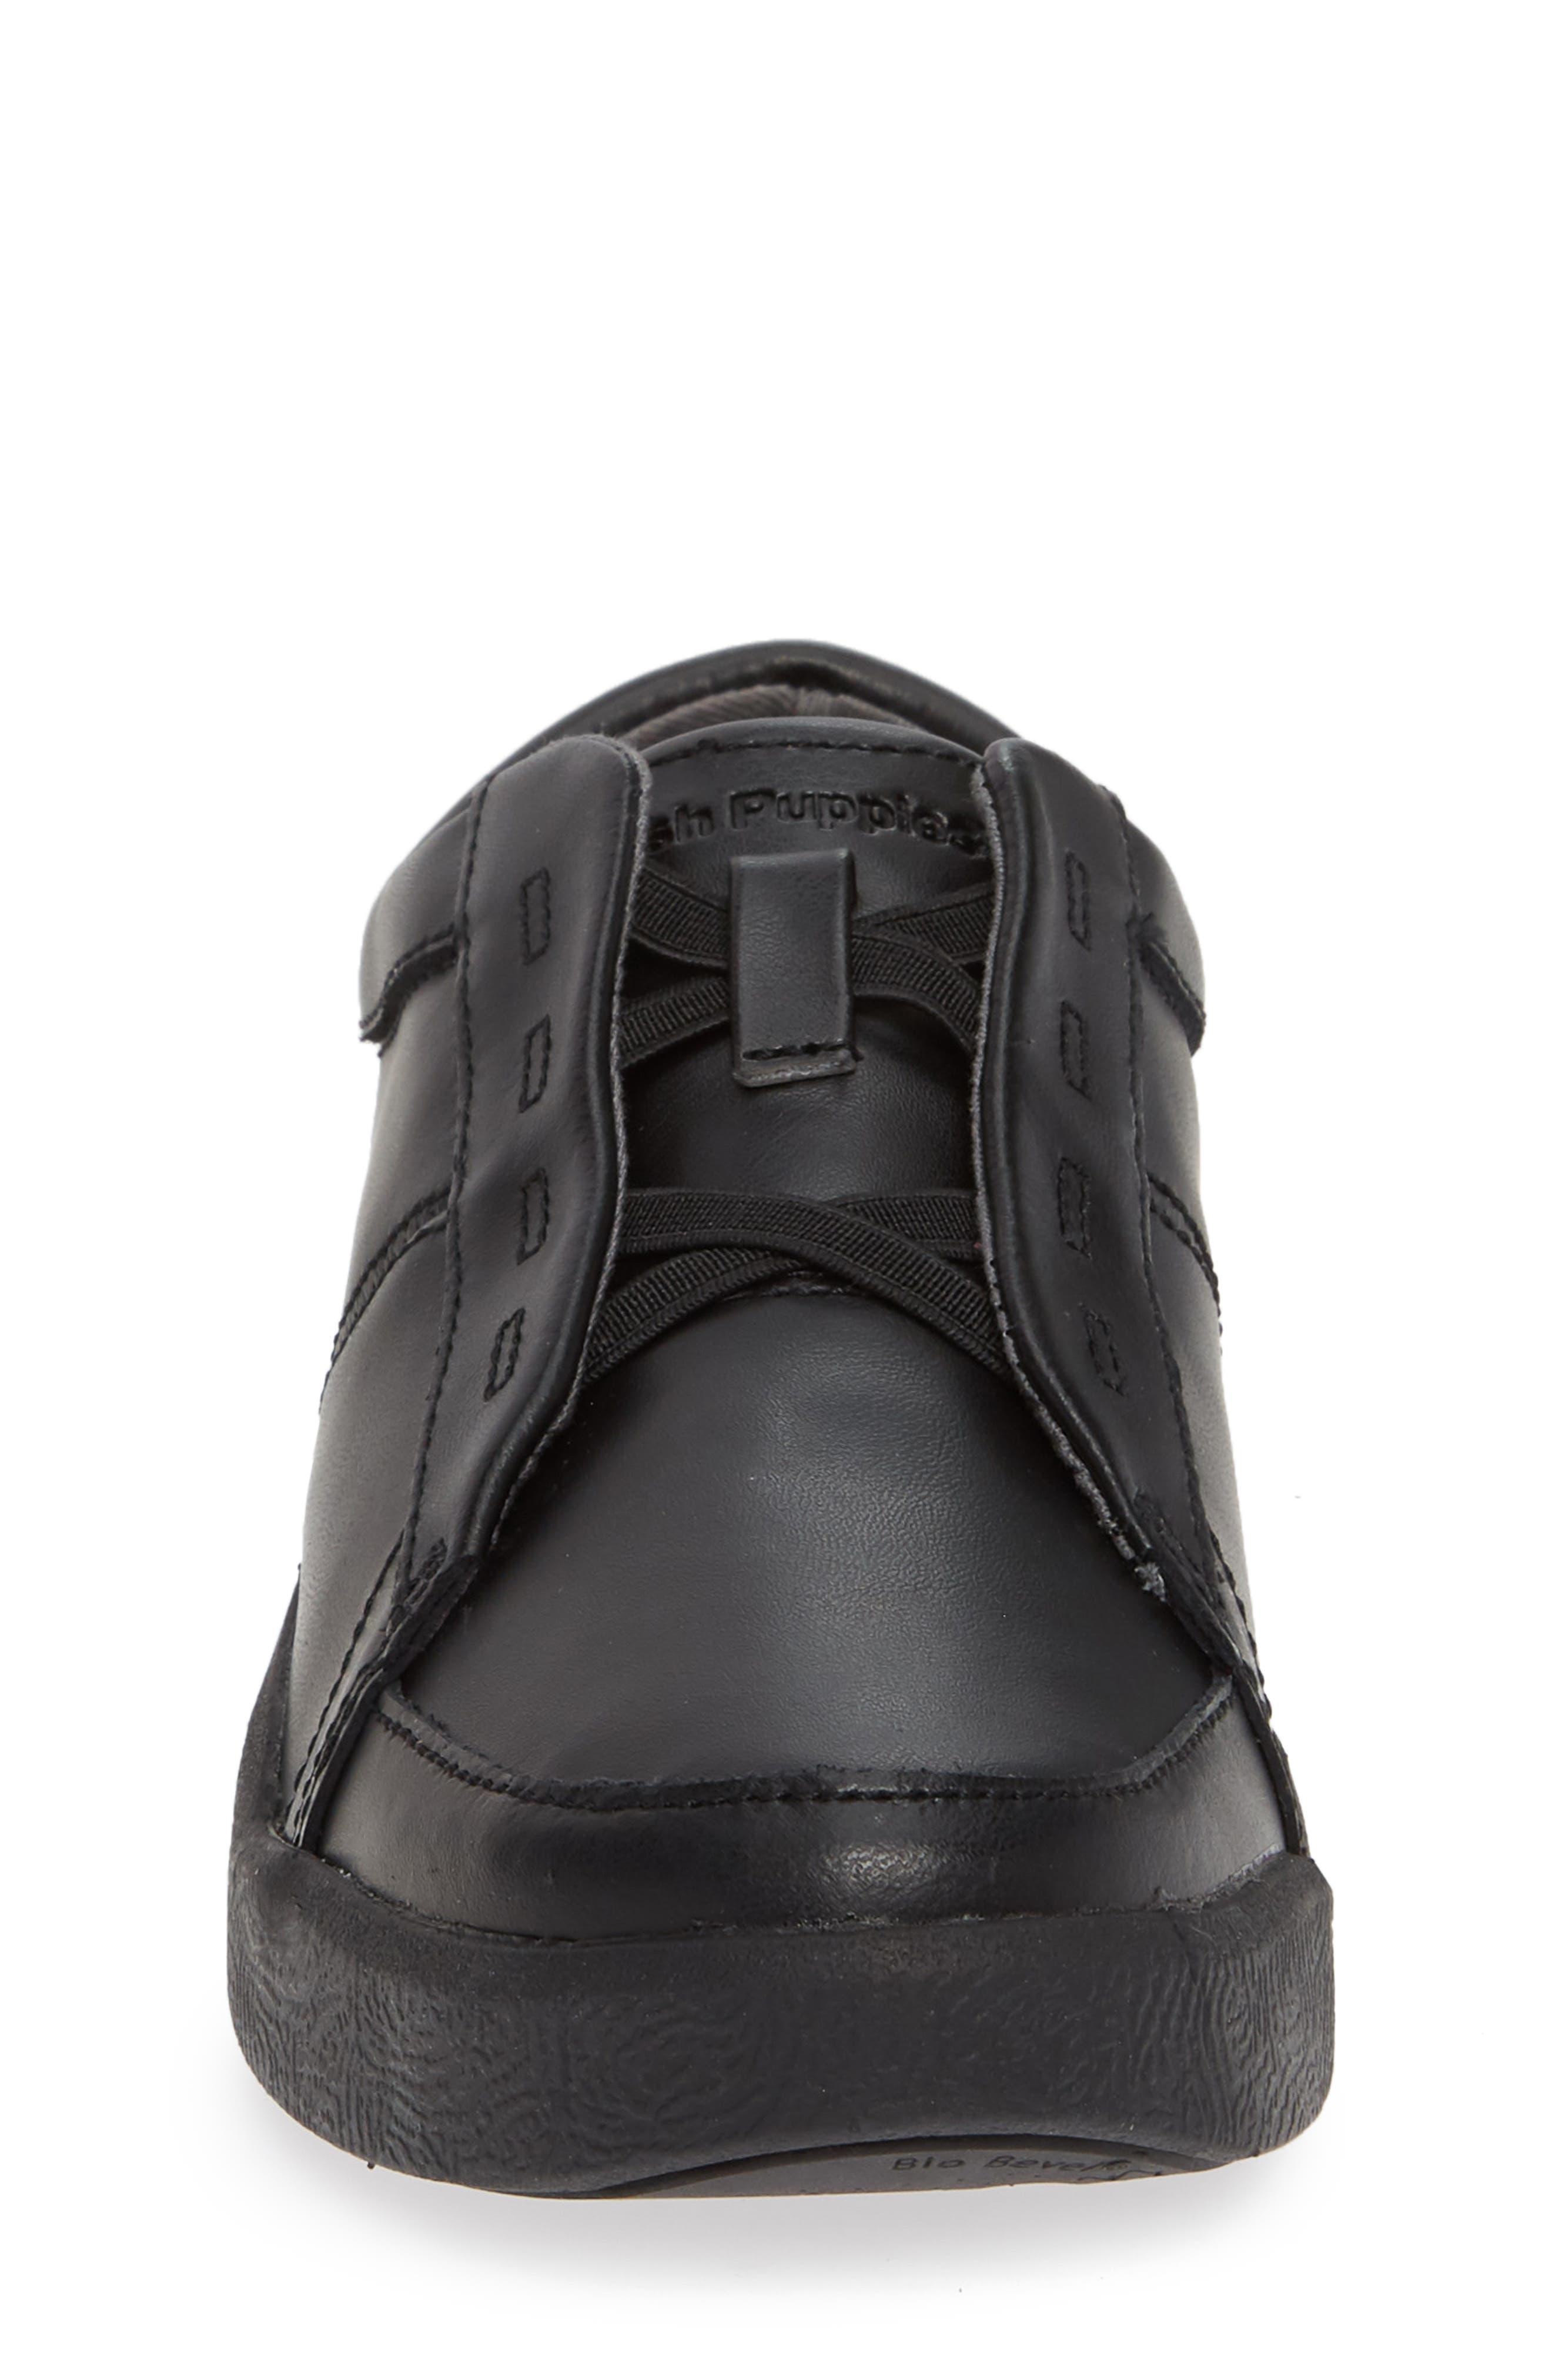 Layden Genius Leather Sneaker,                             Alternate thumbnail 4, color,                             BLACK/ BLACK